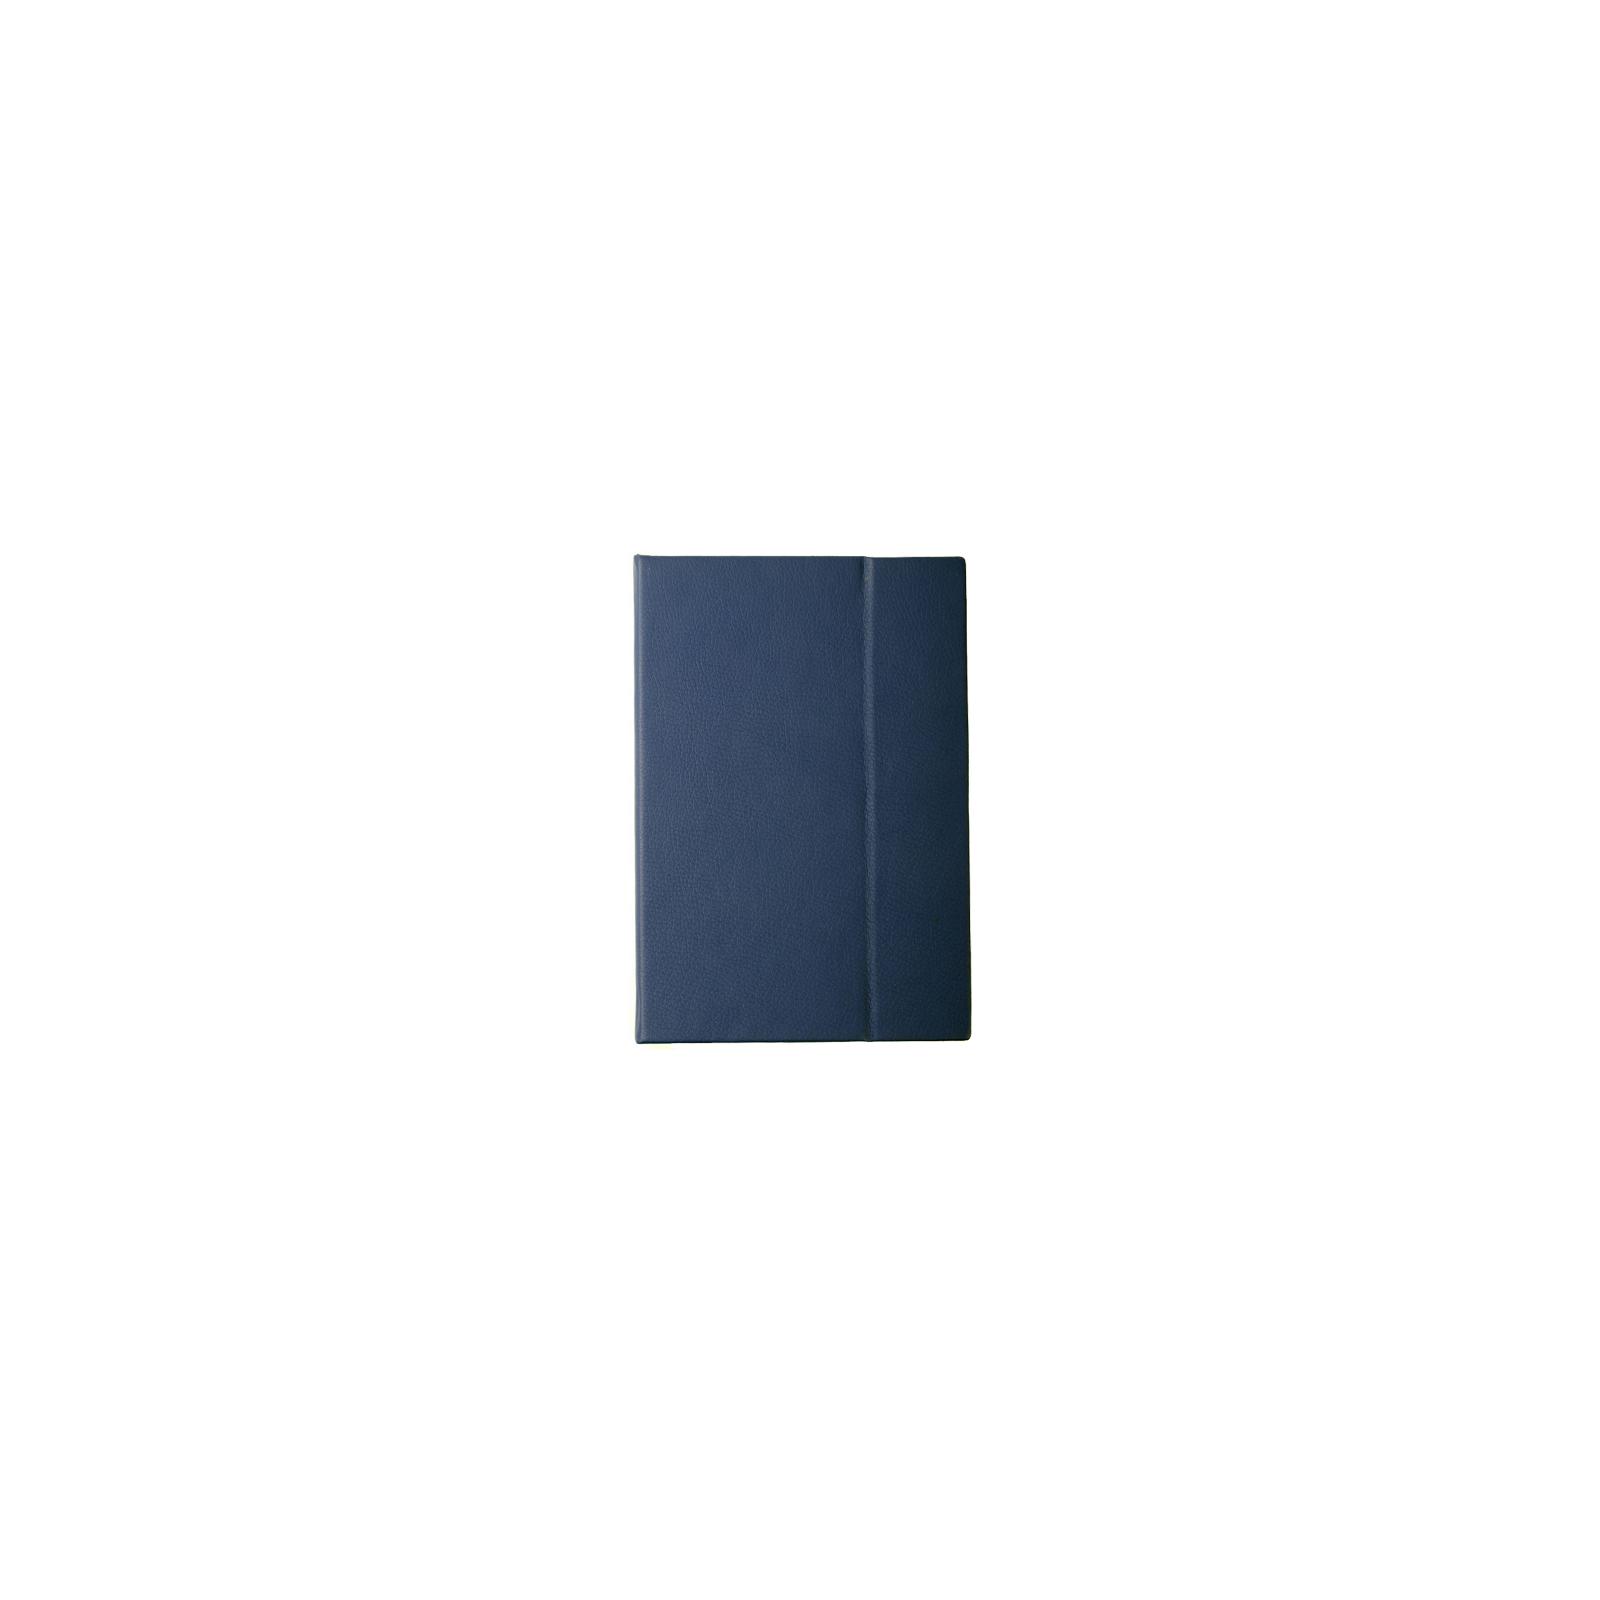 Чехол для планшета Vento 7 Desire Matt - dark blue изображение 2